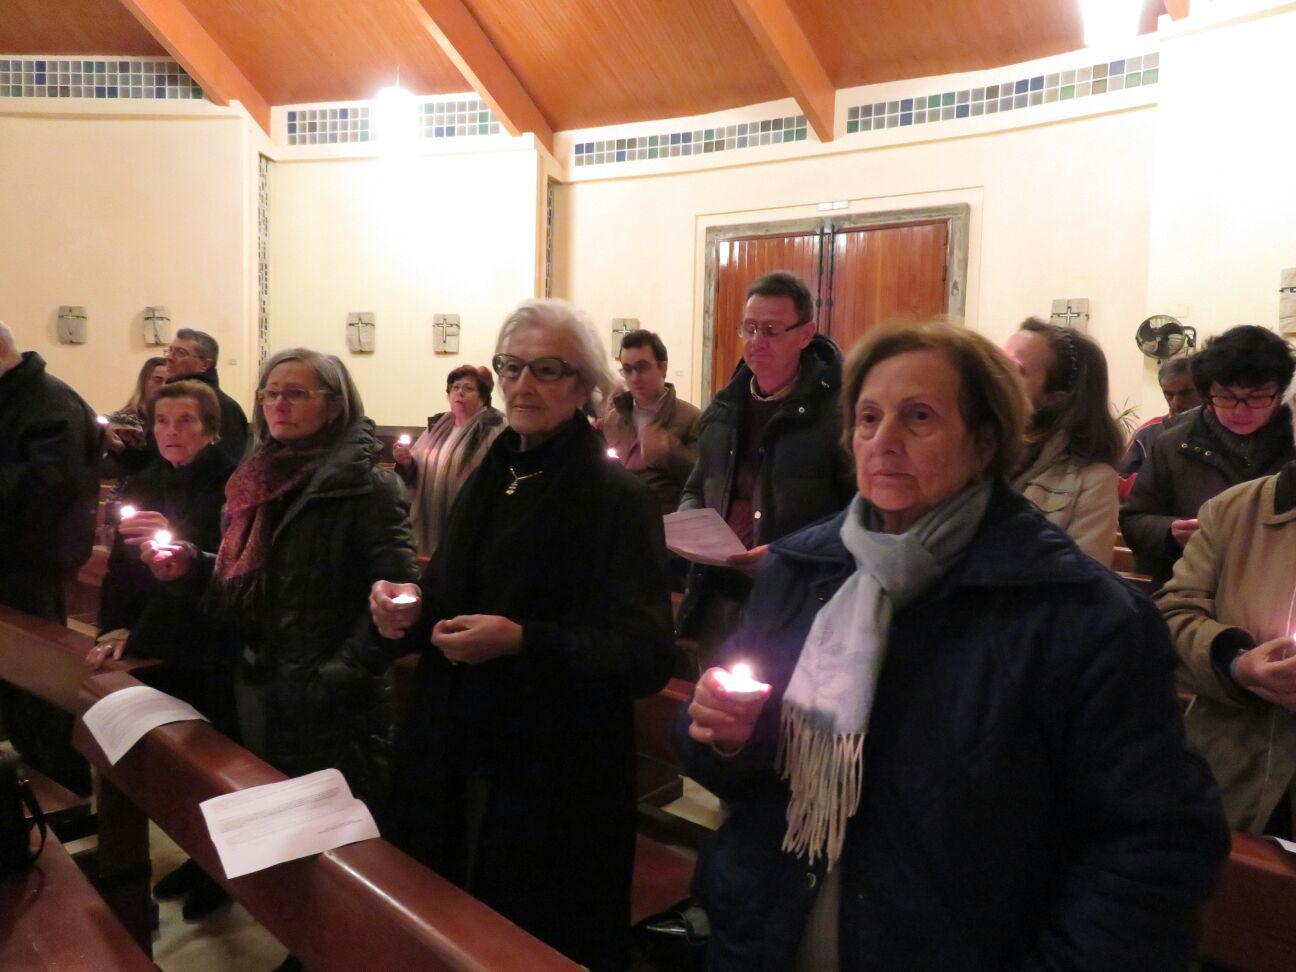 ntro Ecuménico en la parroquia de Santa Mª Goretti, en Málaga